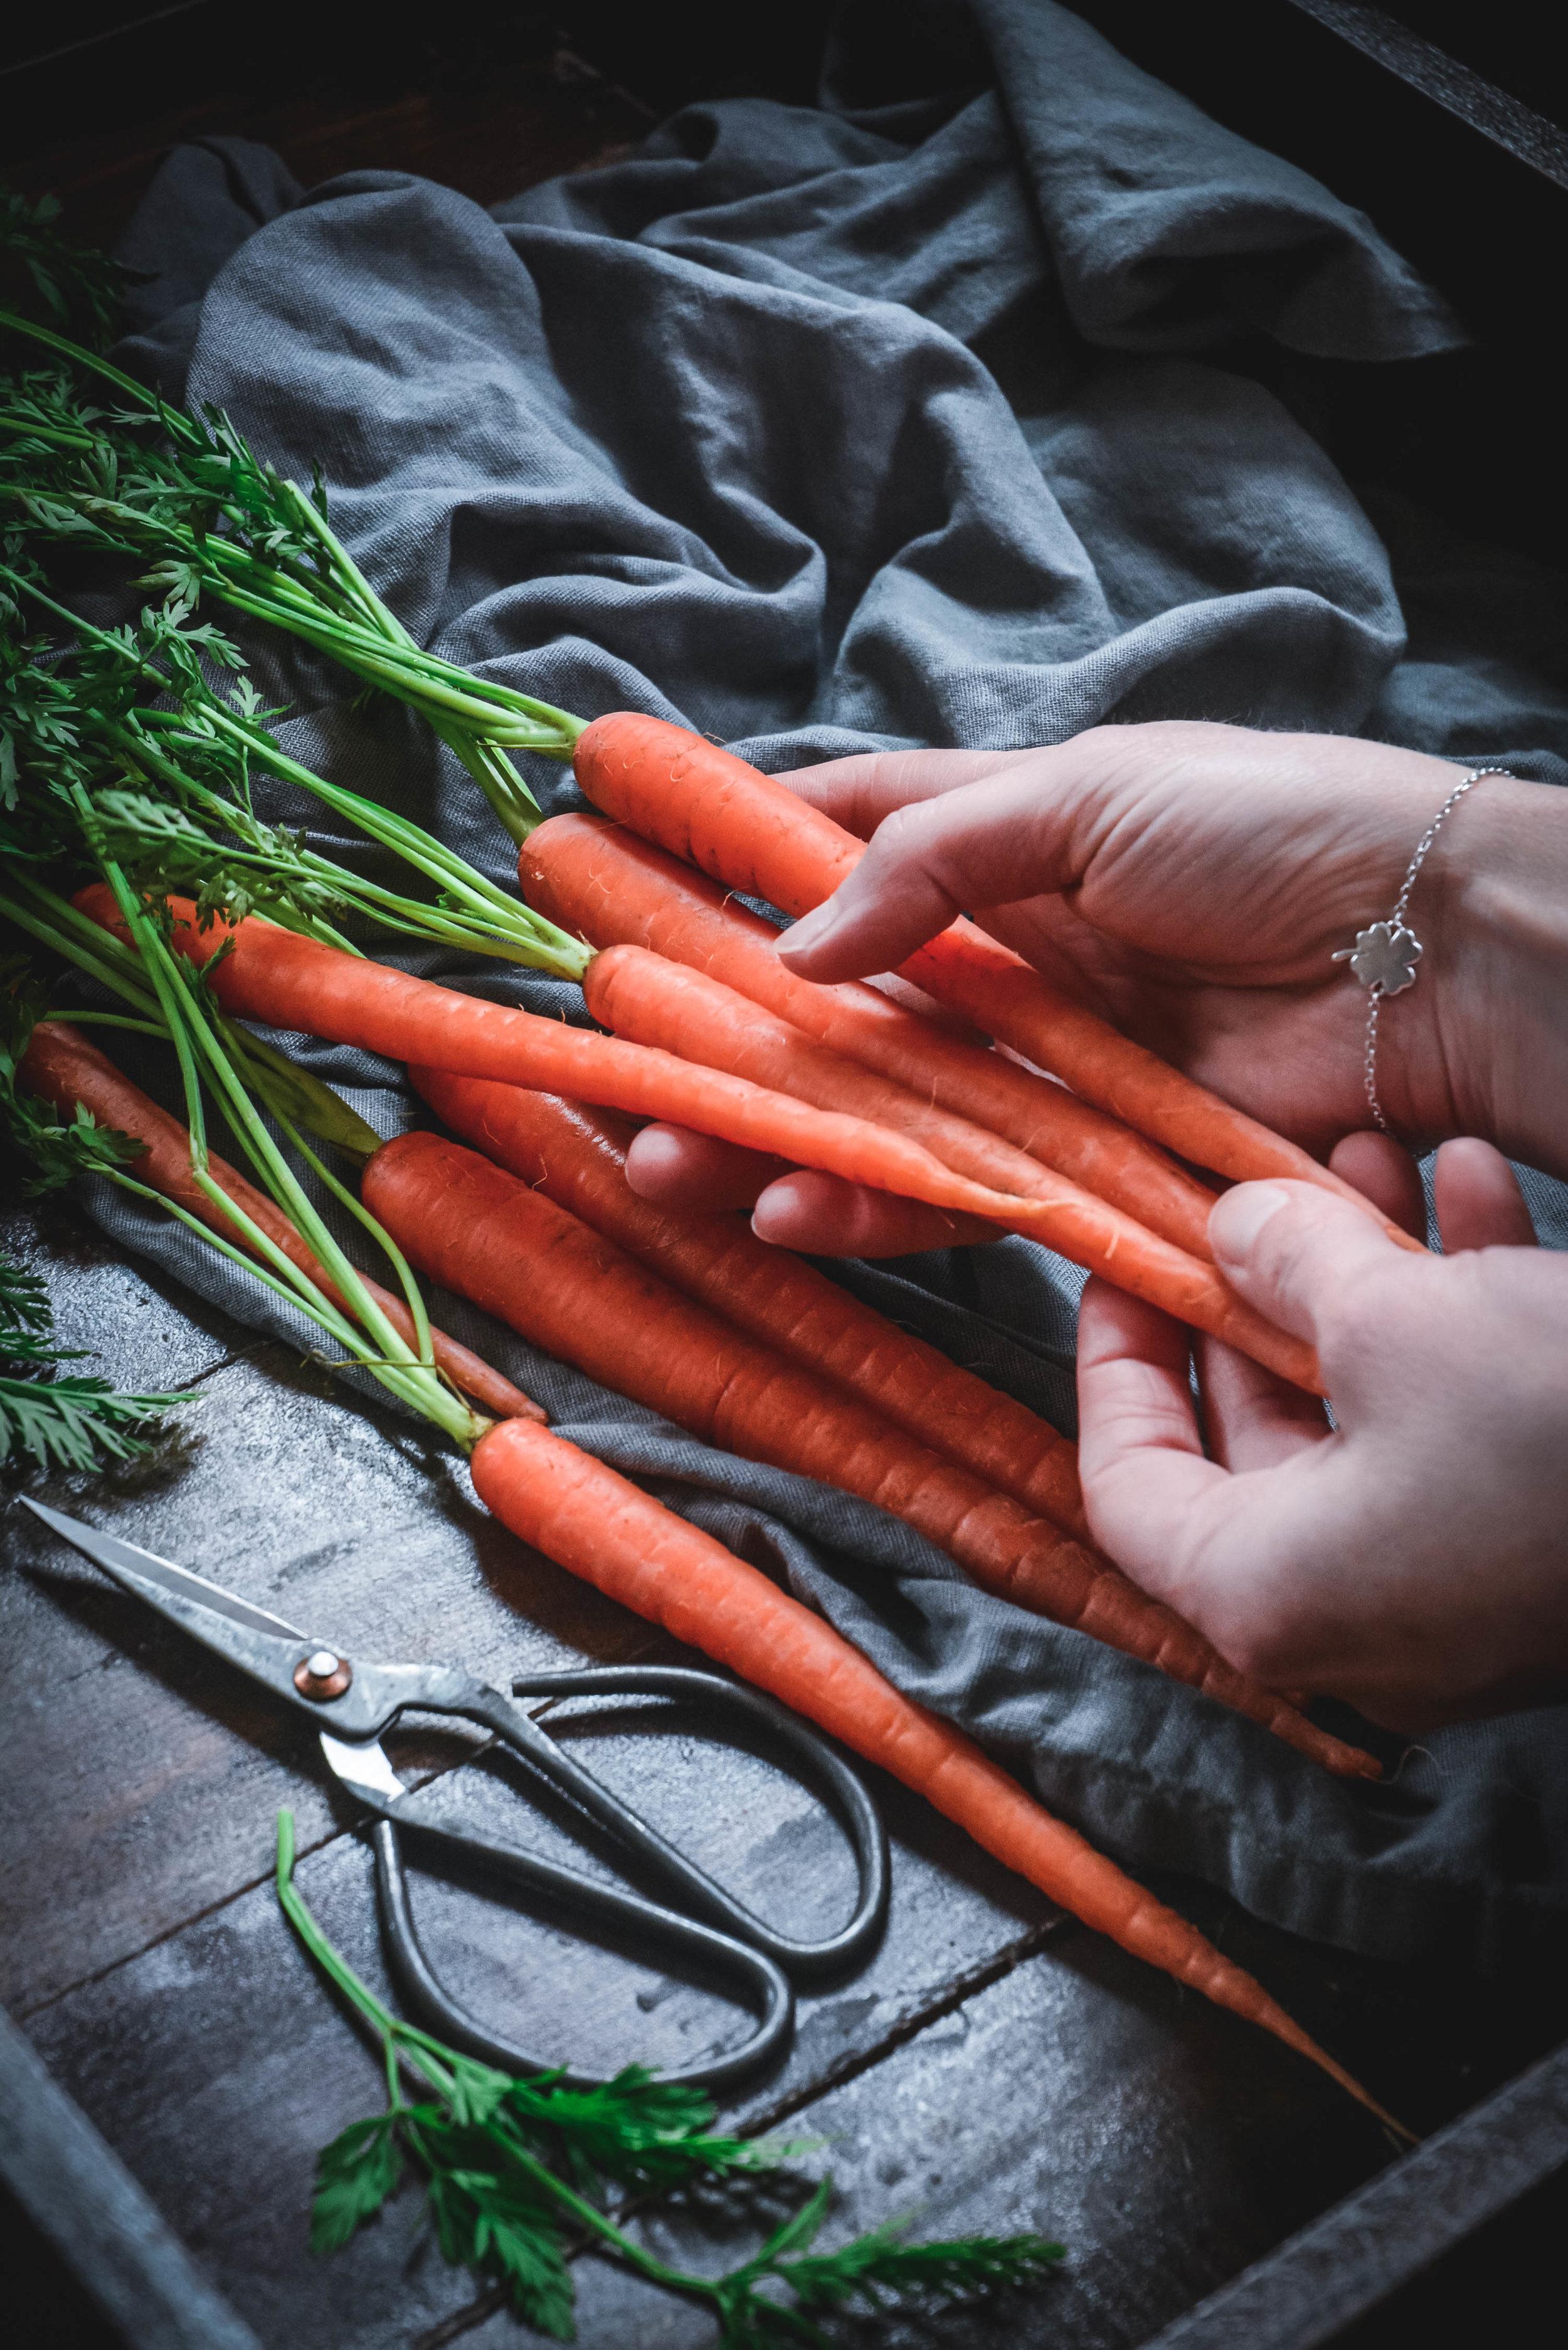 carrots hands.jpg